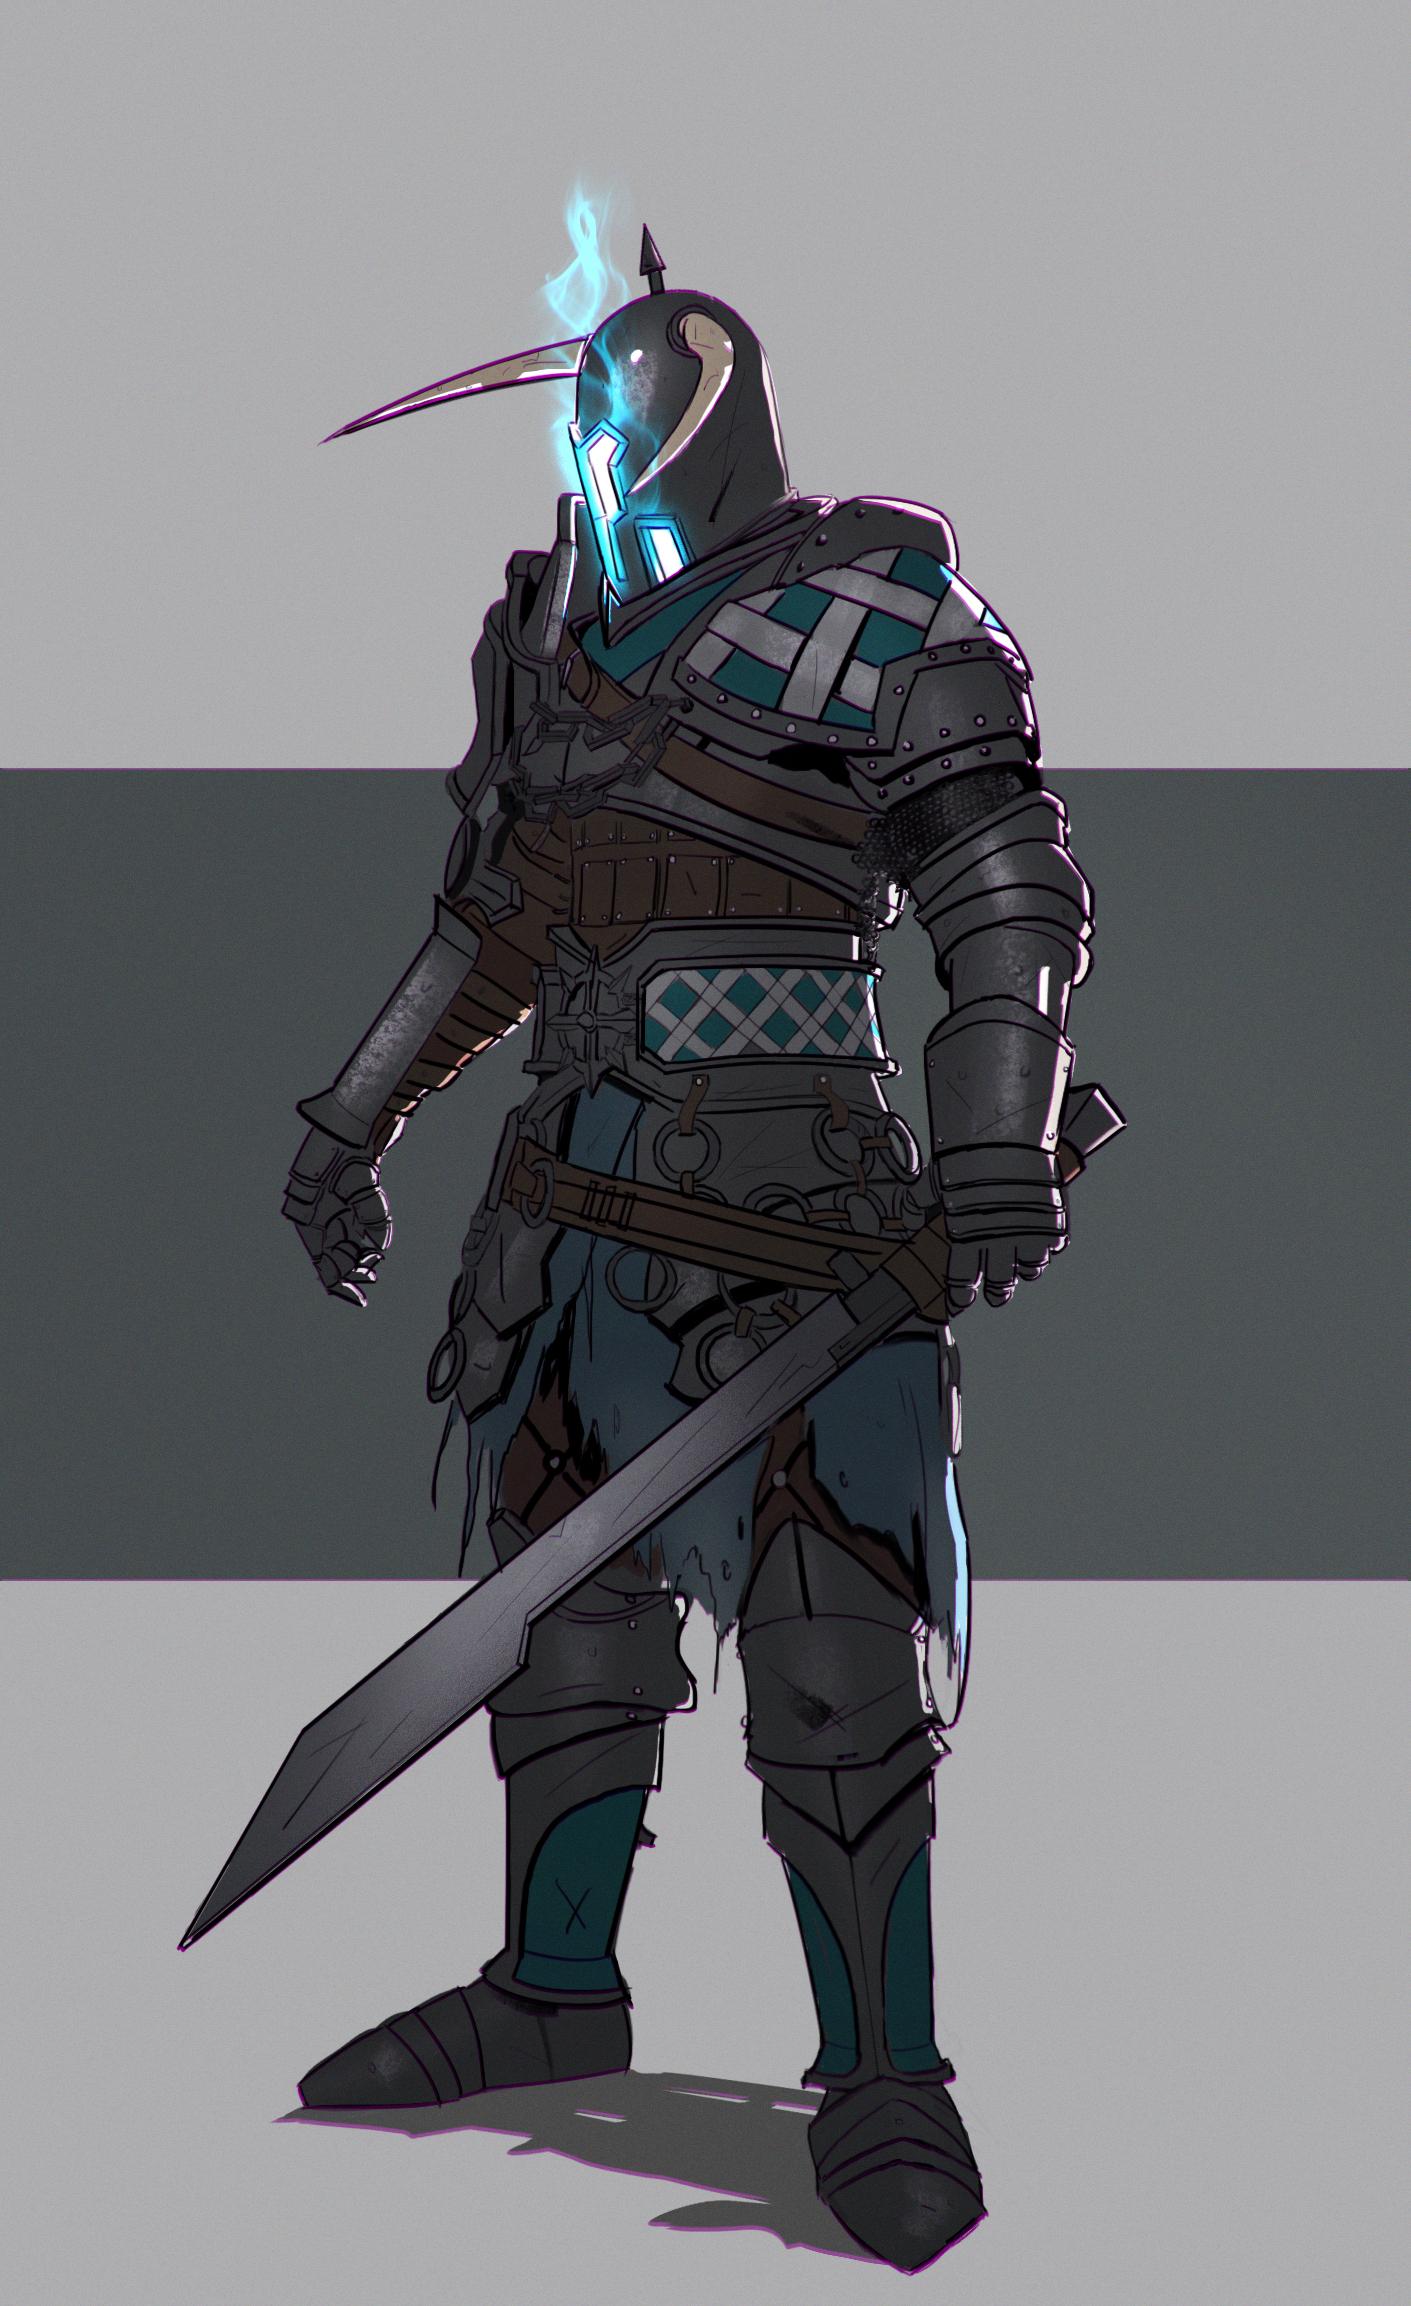 Knight_Concept_art_Jorge_Barrero.jpg